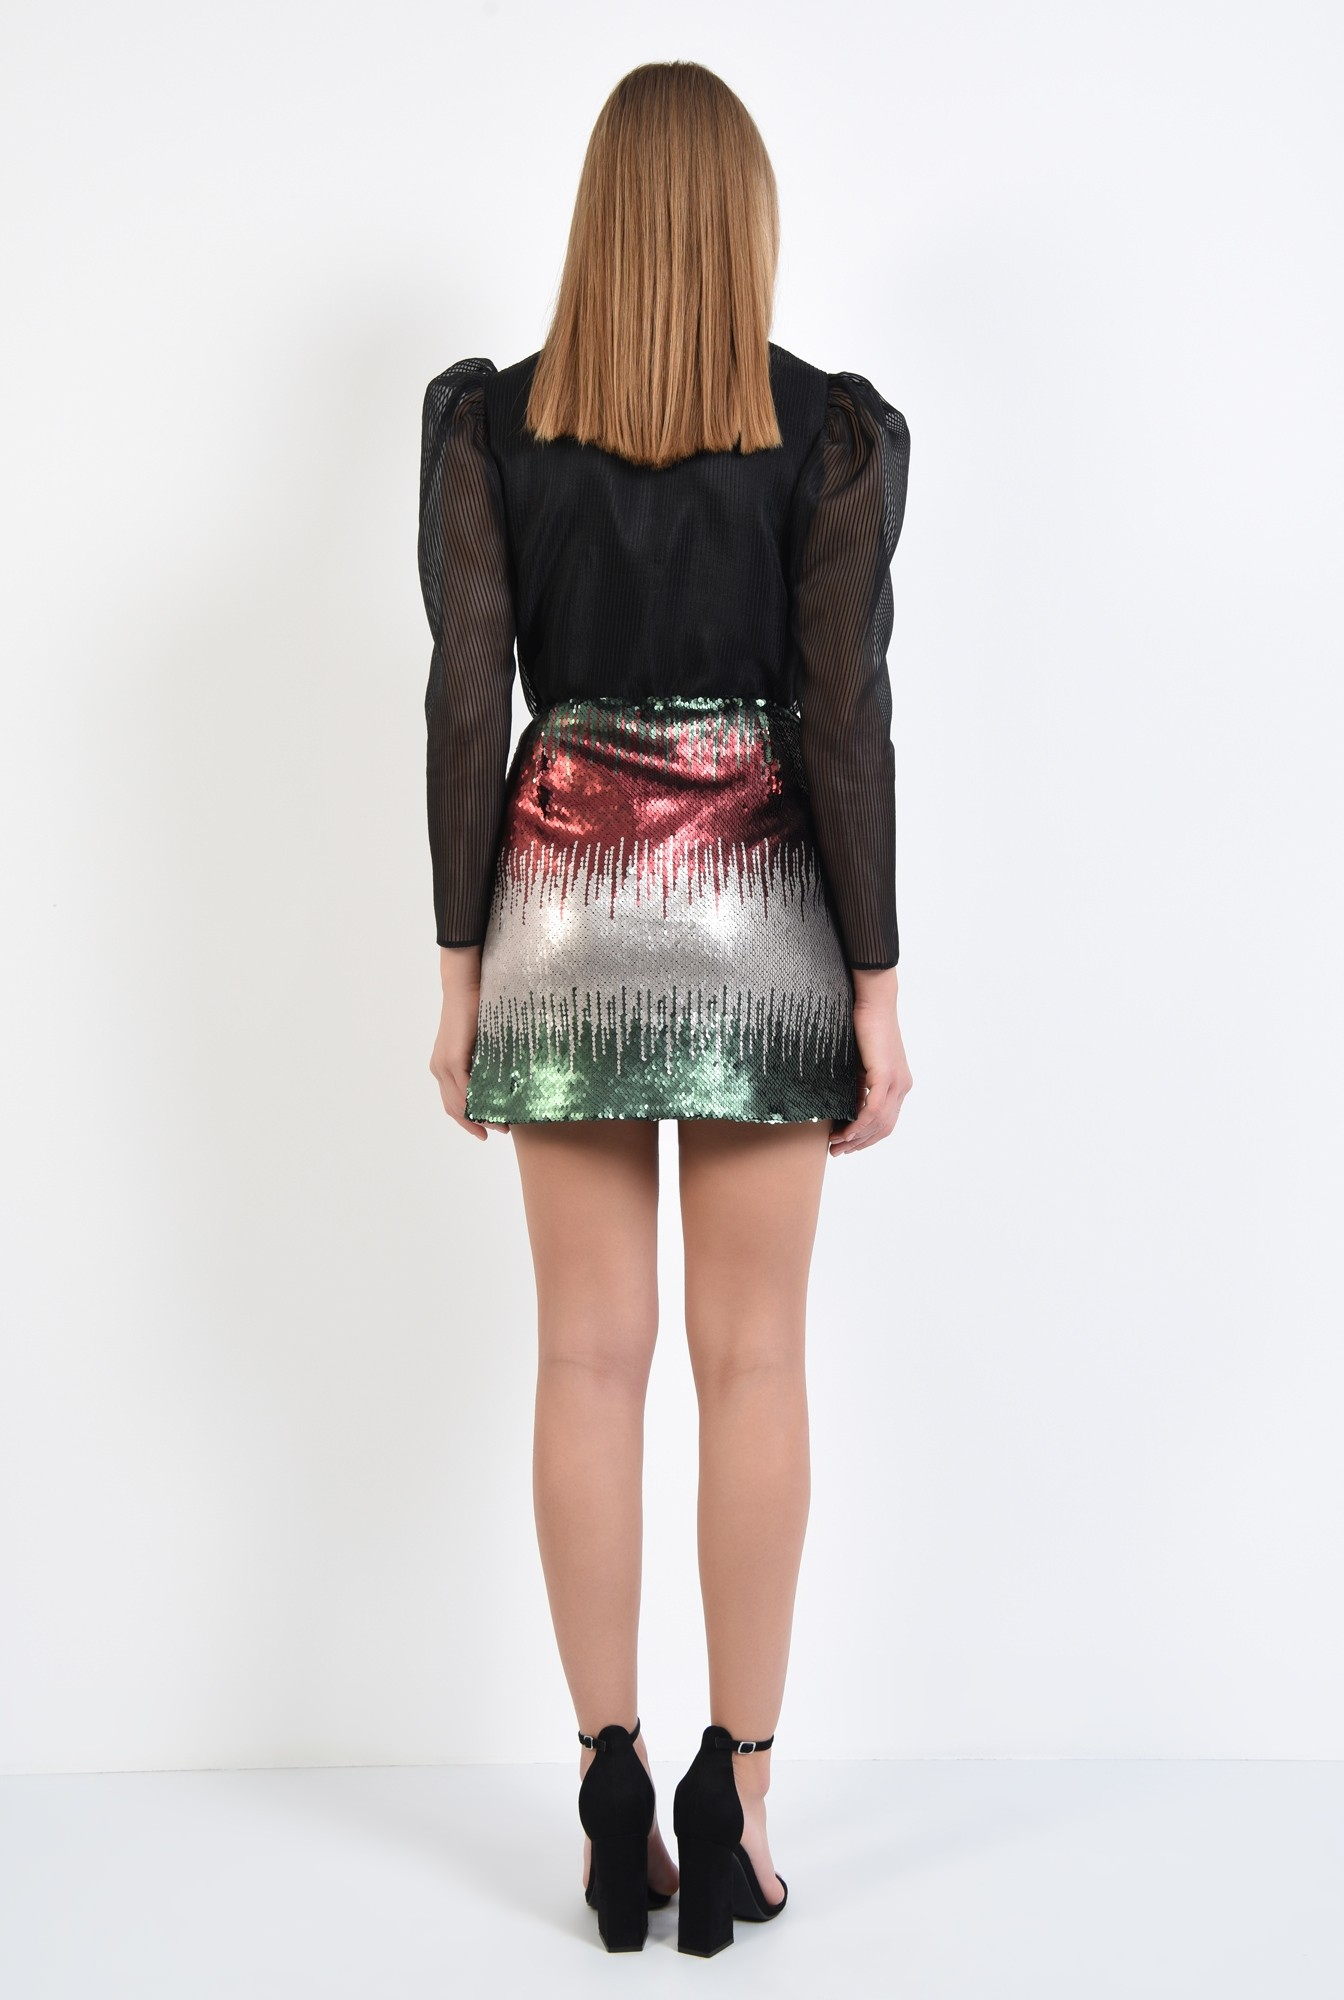 1 - 360 - fusta multicolora, paiete aplicate, croi drept, mini